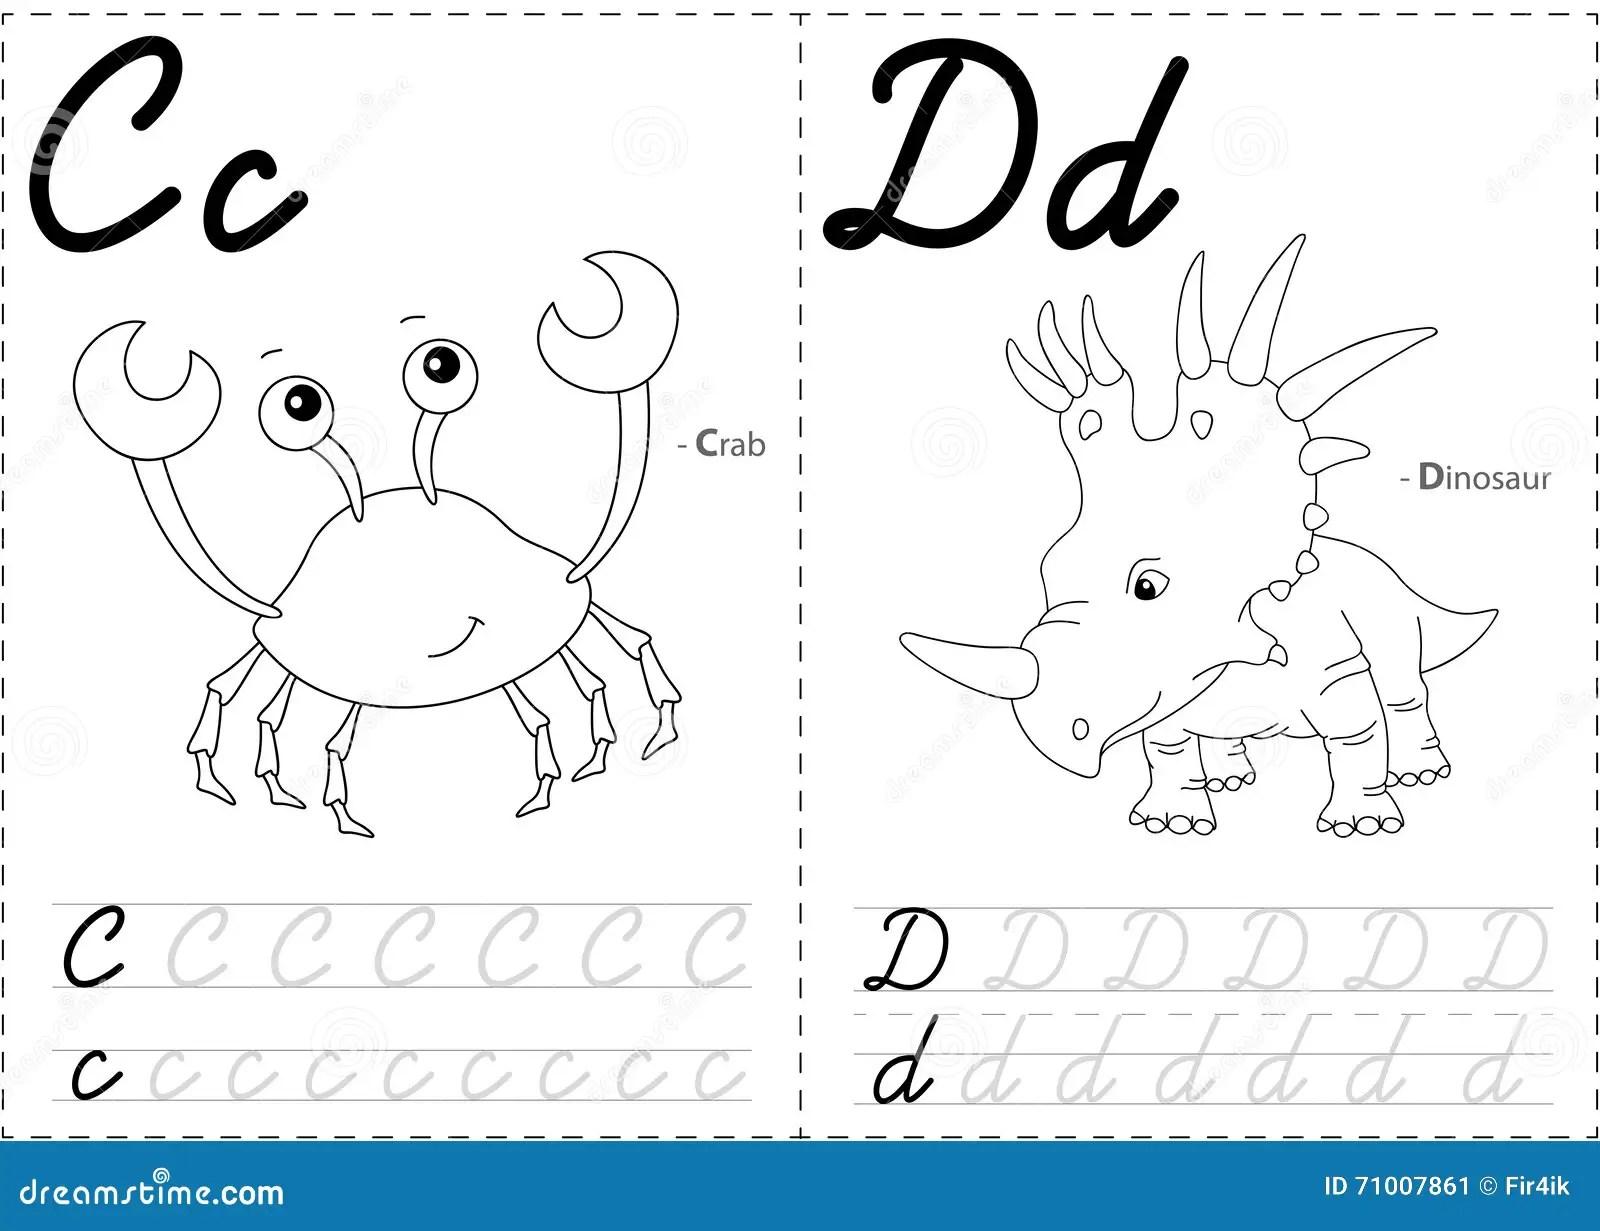 Cartoon Crab And Dinosaur Alphabet Tracing Worksheet